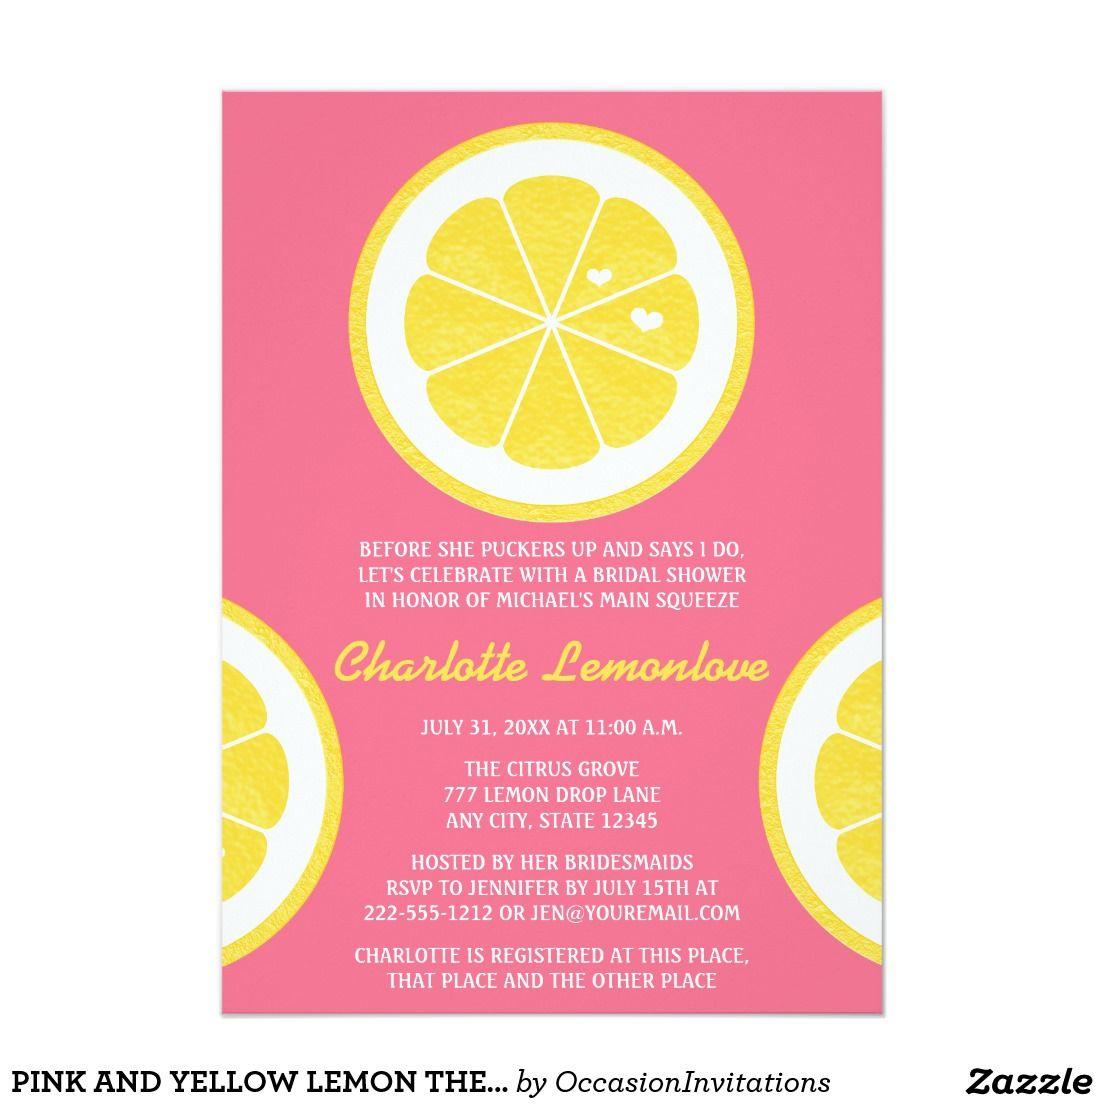 Pink and yellow lemon themed bridal shower card themed bridal